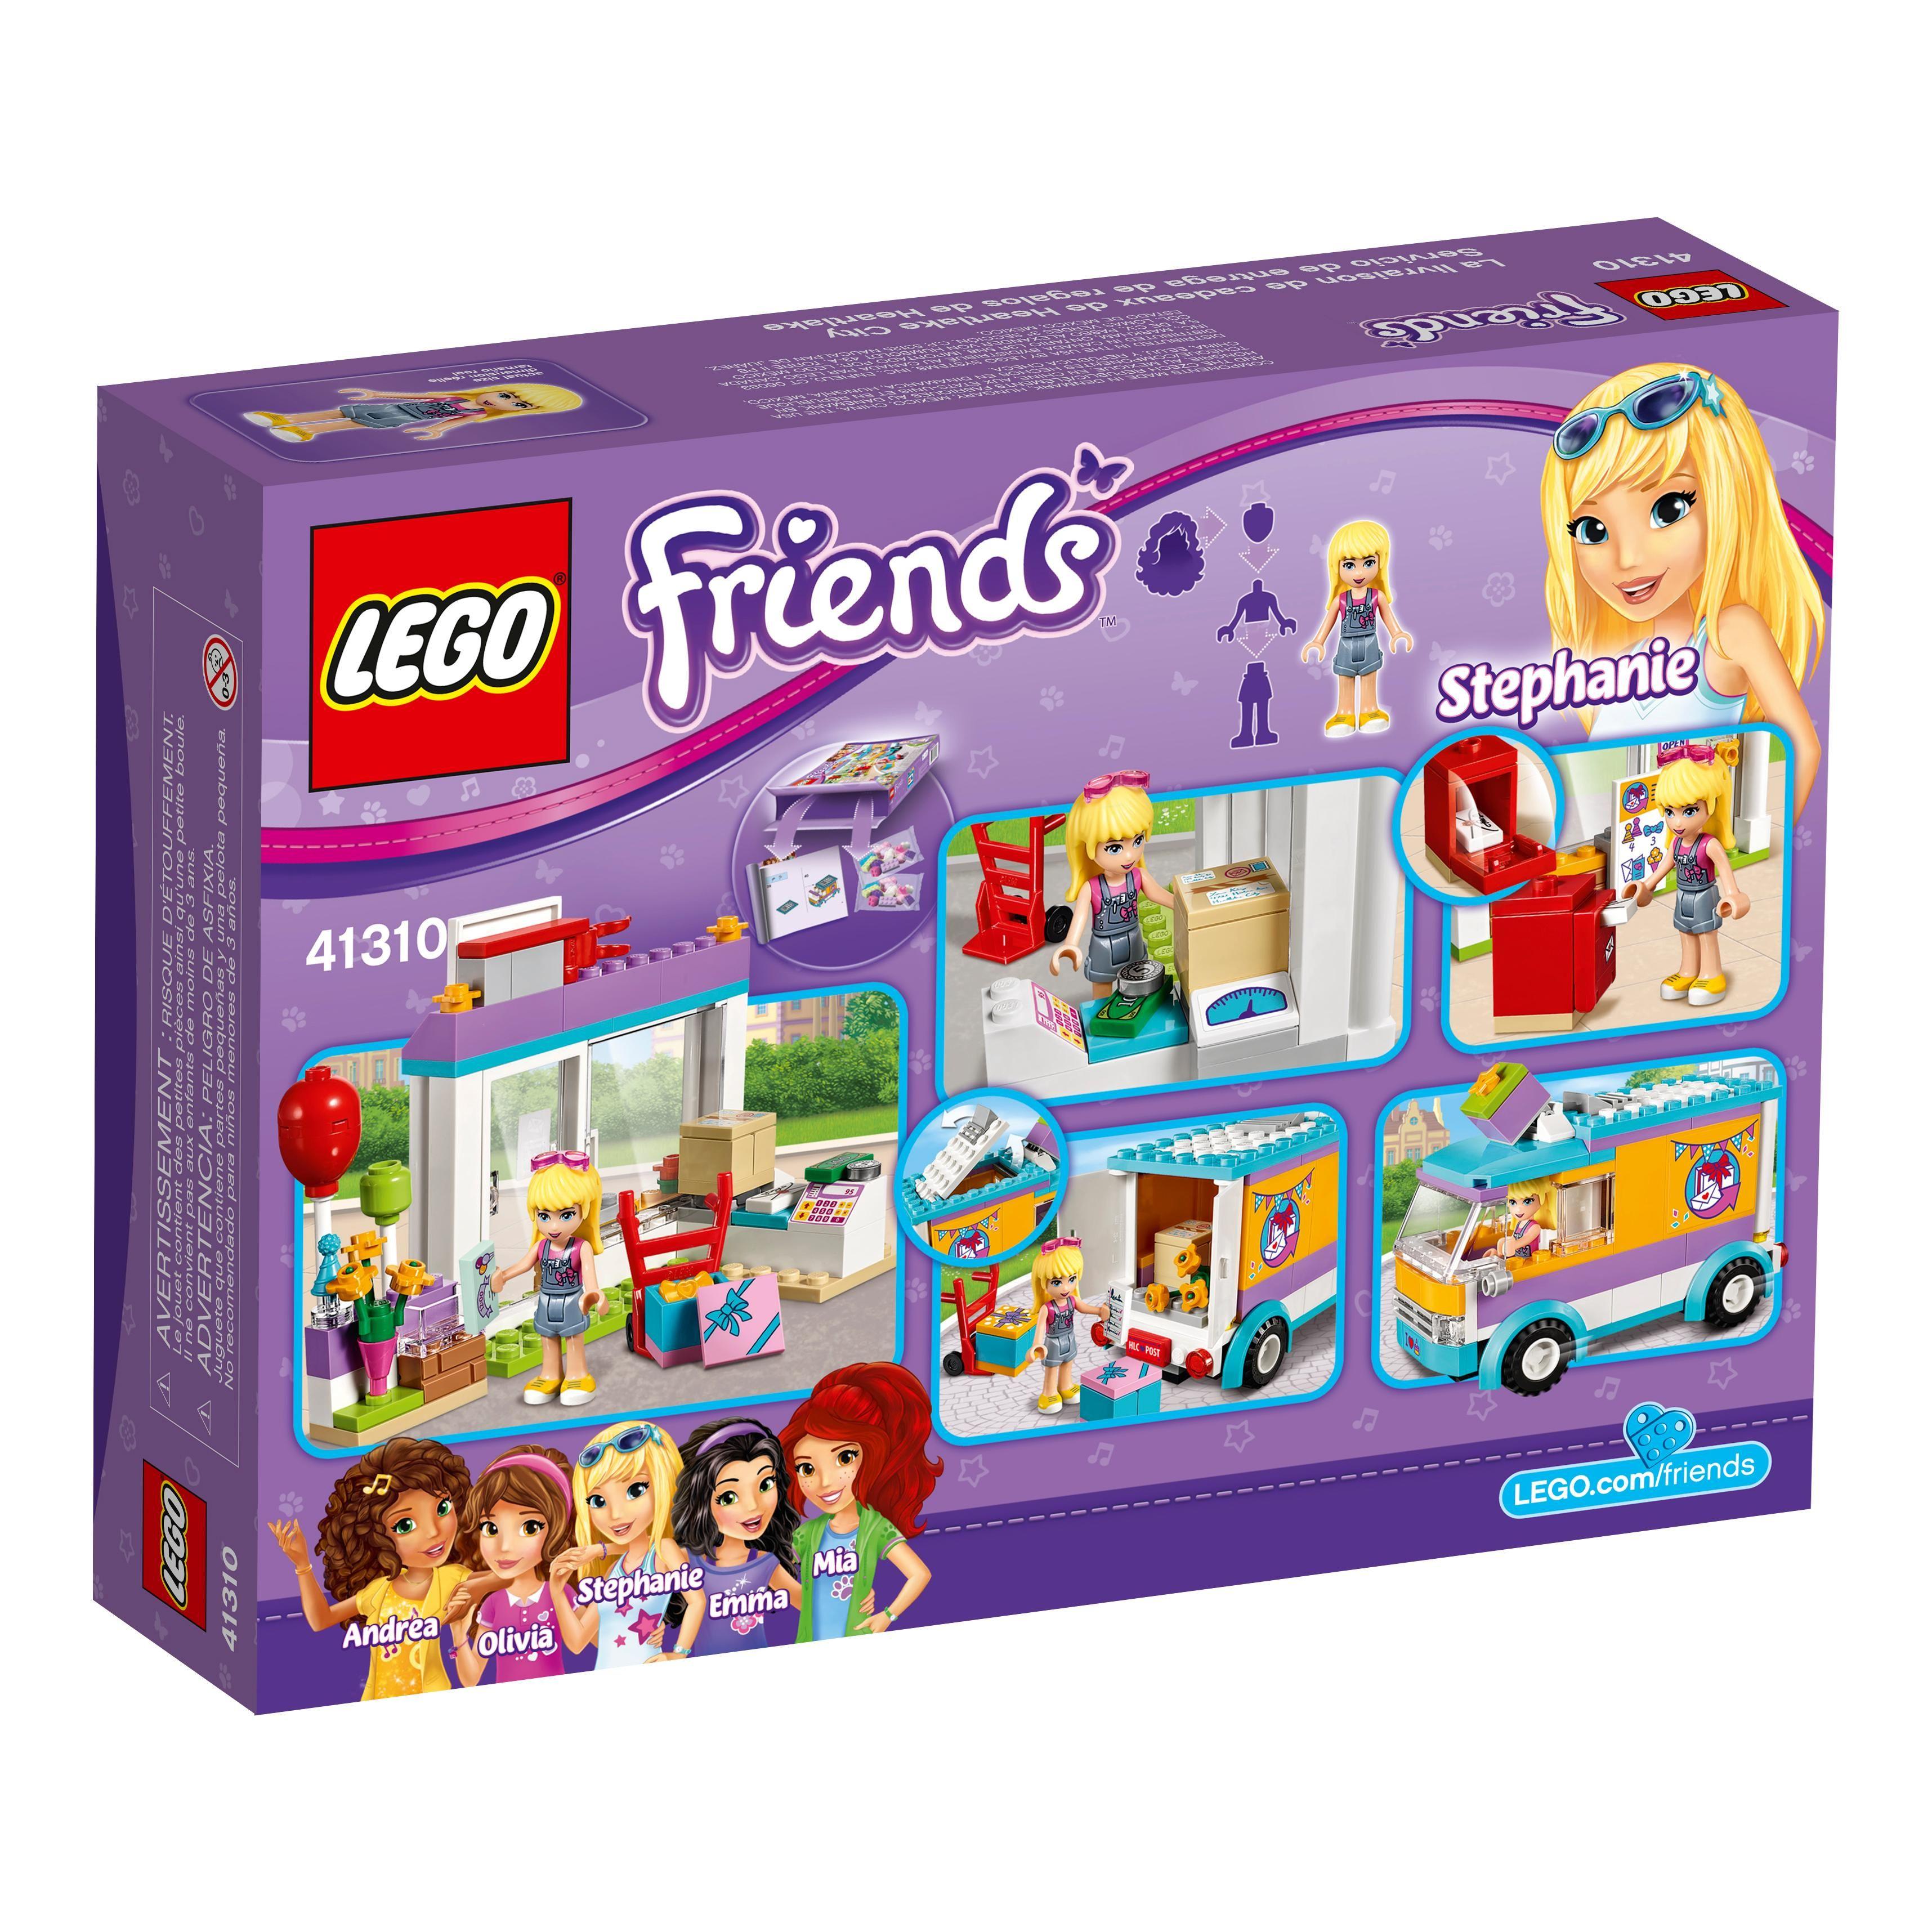 Lego Friends Heartlake Supermarket Toys Lego Friends Sets Lego